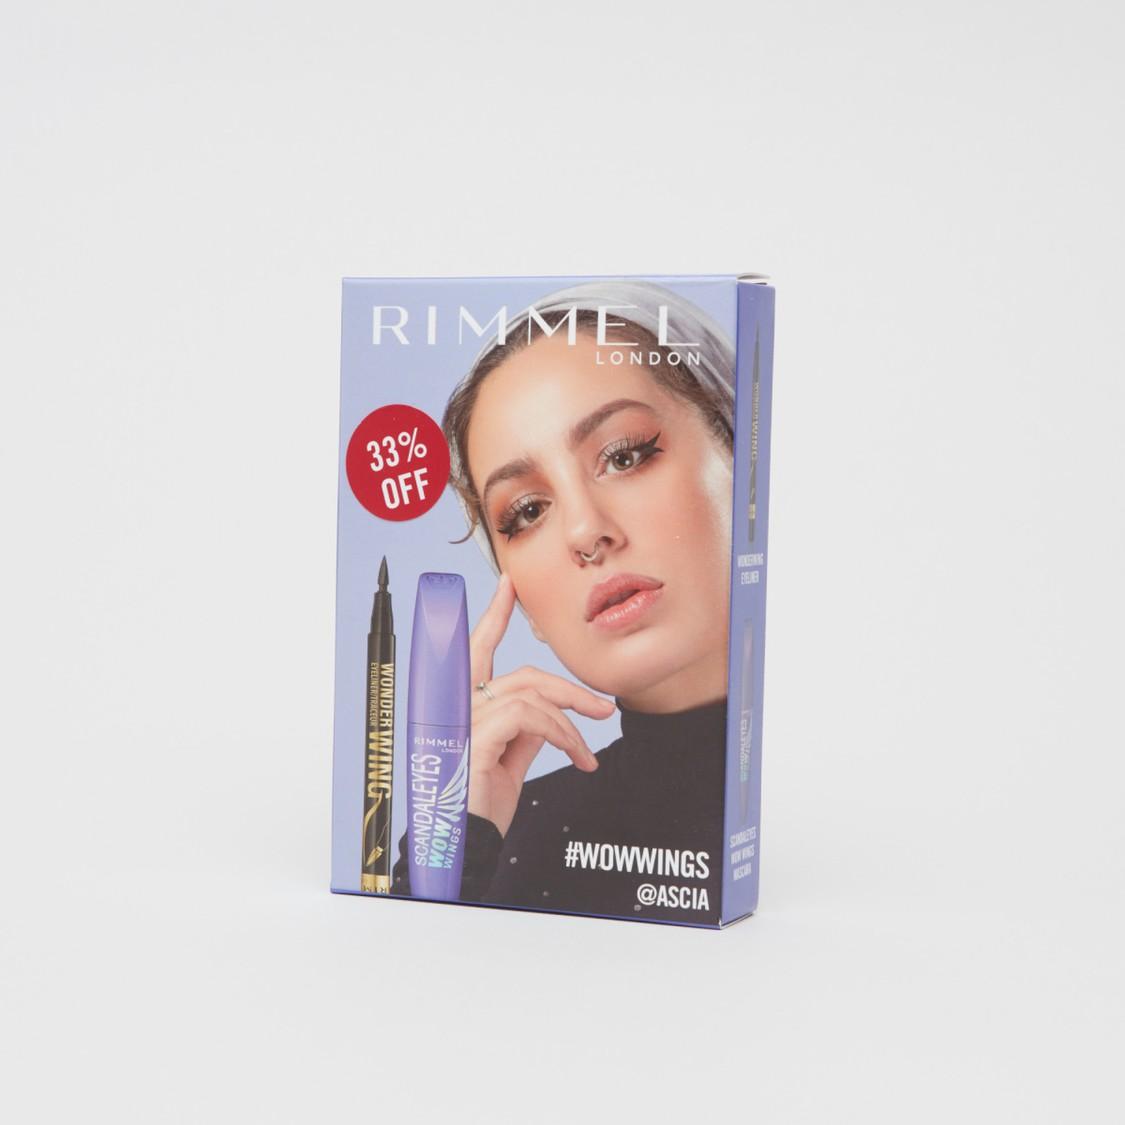 Rimmel Wow Mascara and Wonderwing Eyeliner - 13.5 ml